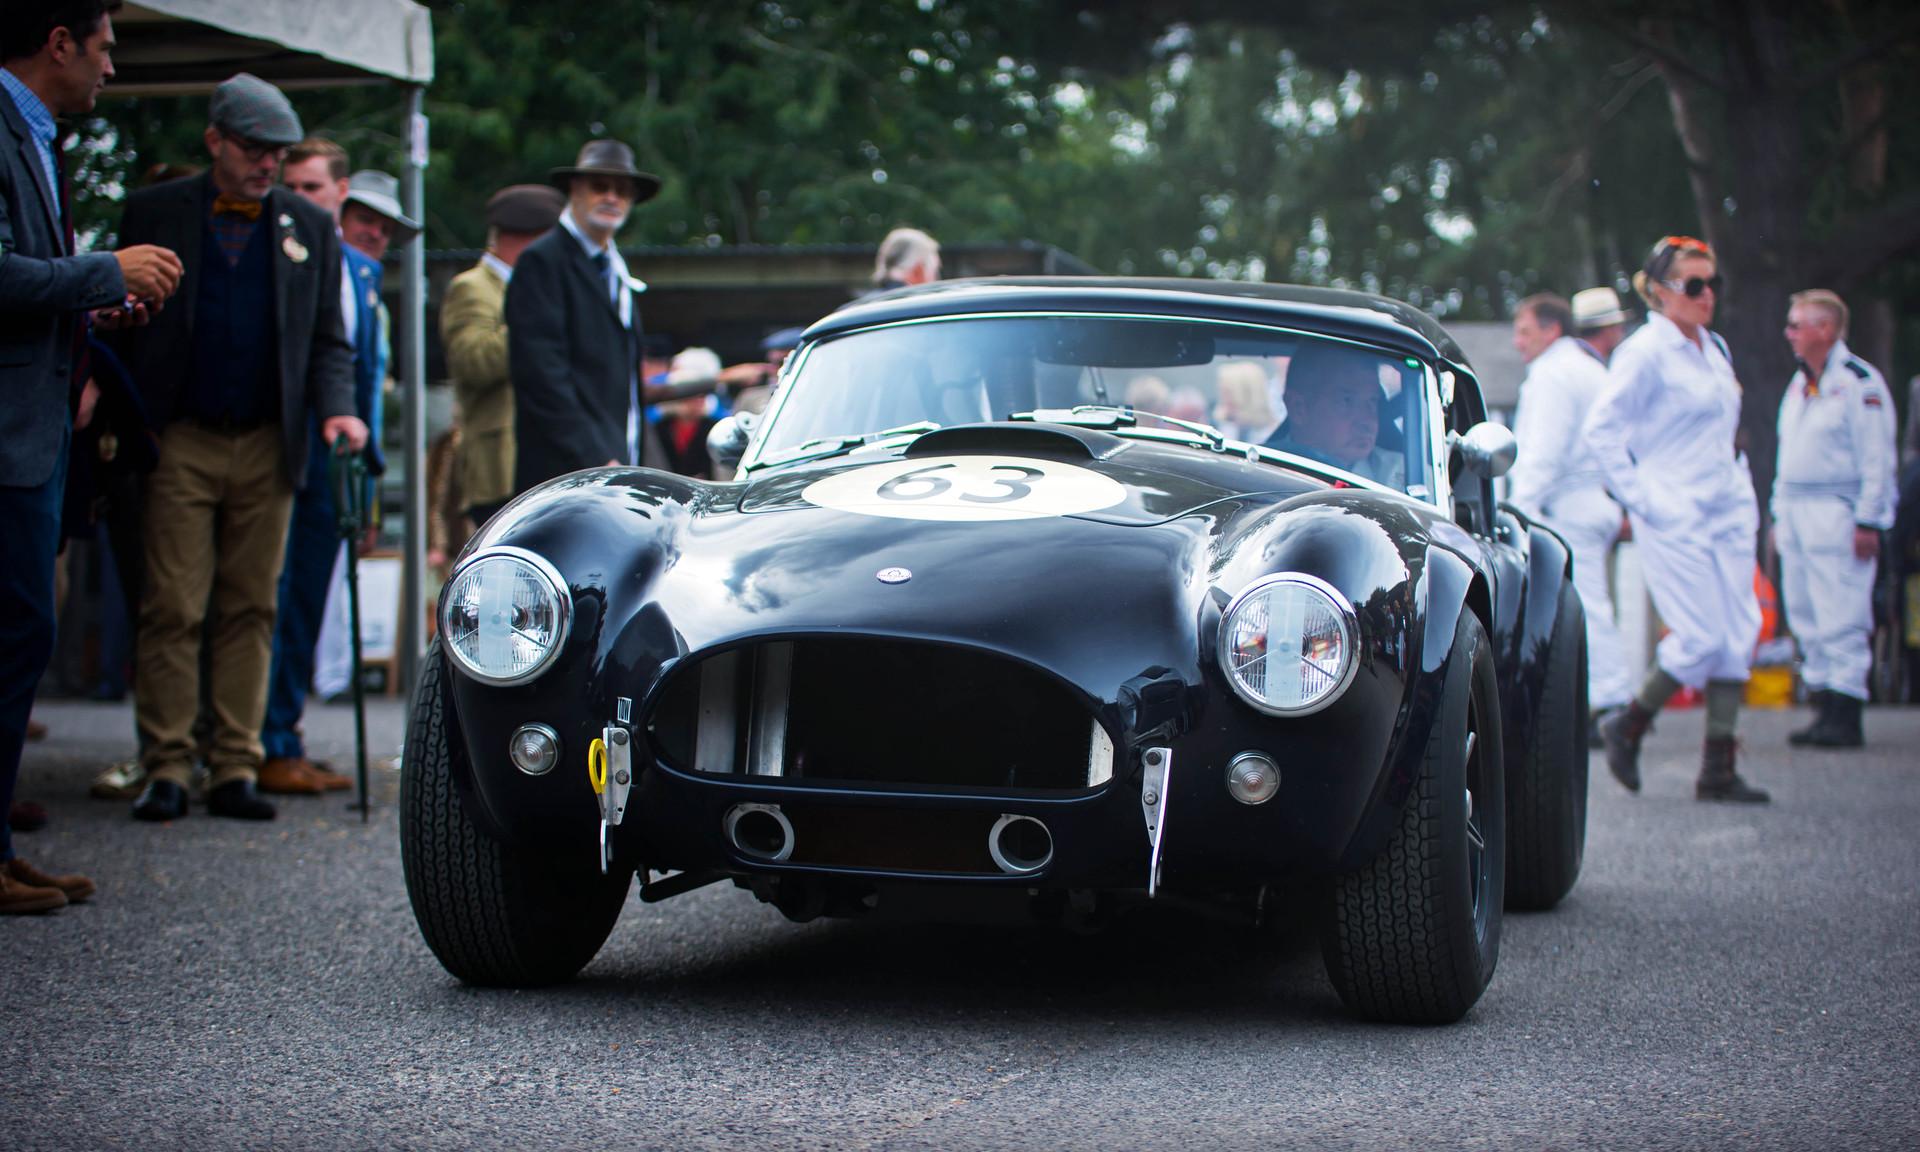 Karsten Le Blanc & Martin Stretton's AC Cobra